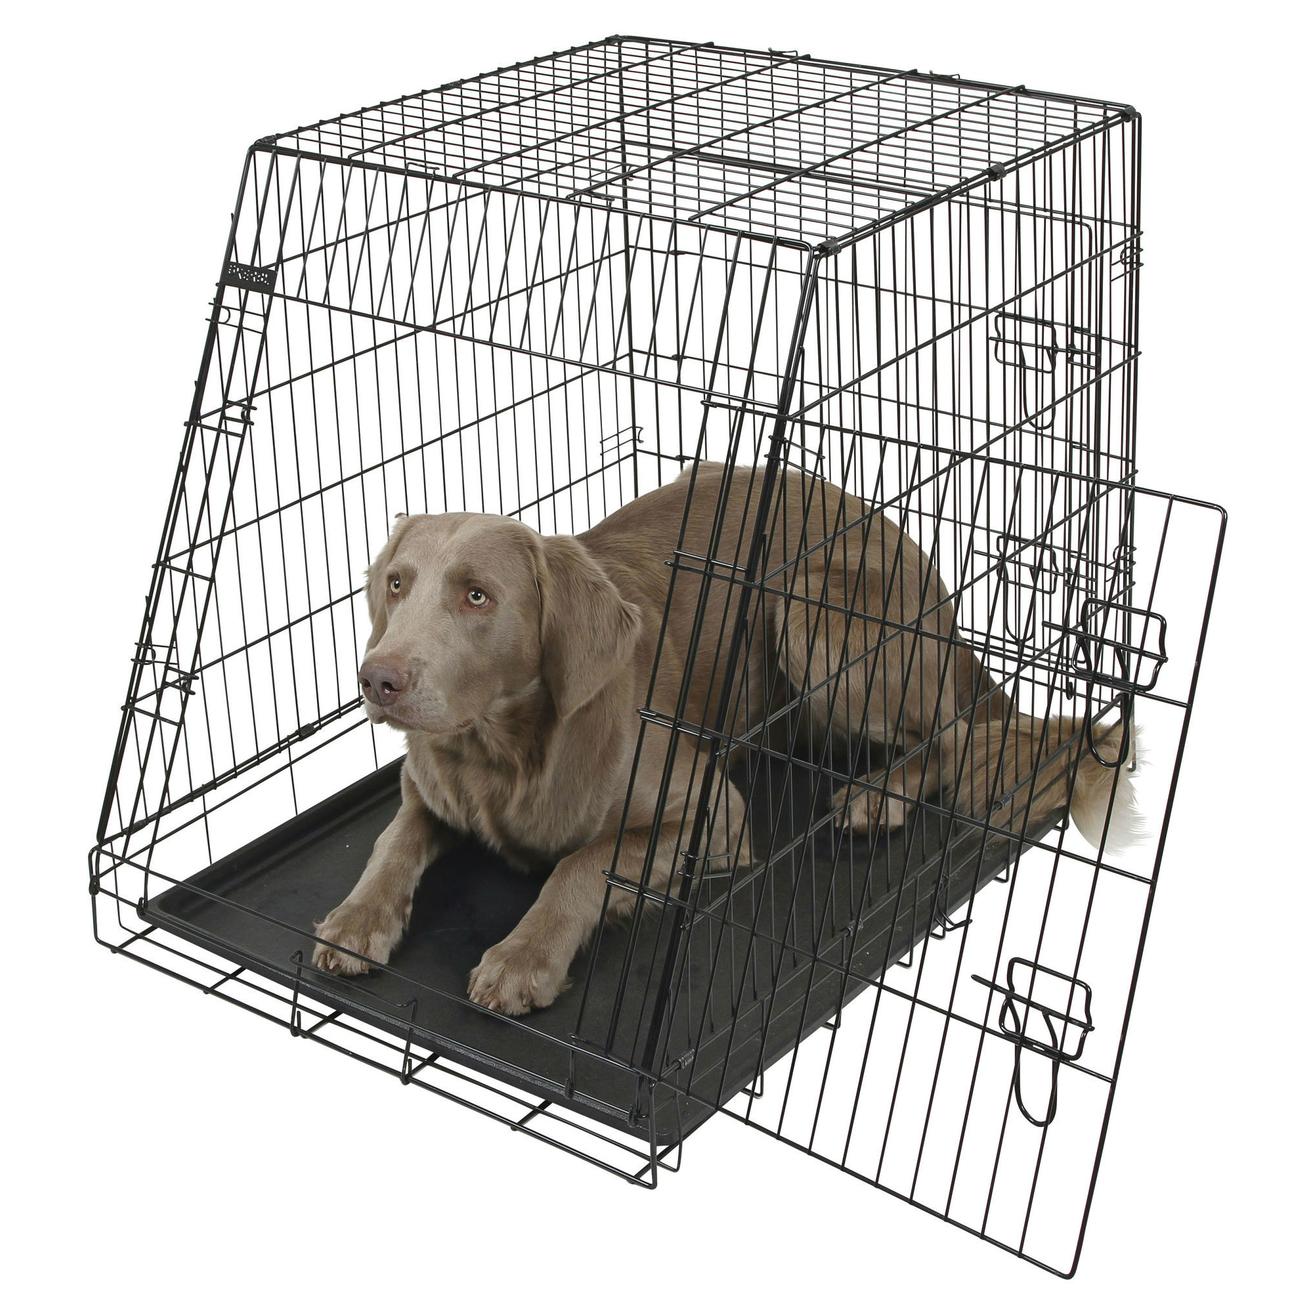 Kerbl Gitter Transportbox für Hunde abgeschrägt, Bild 3